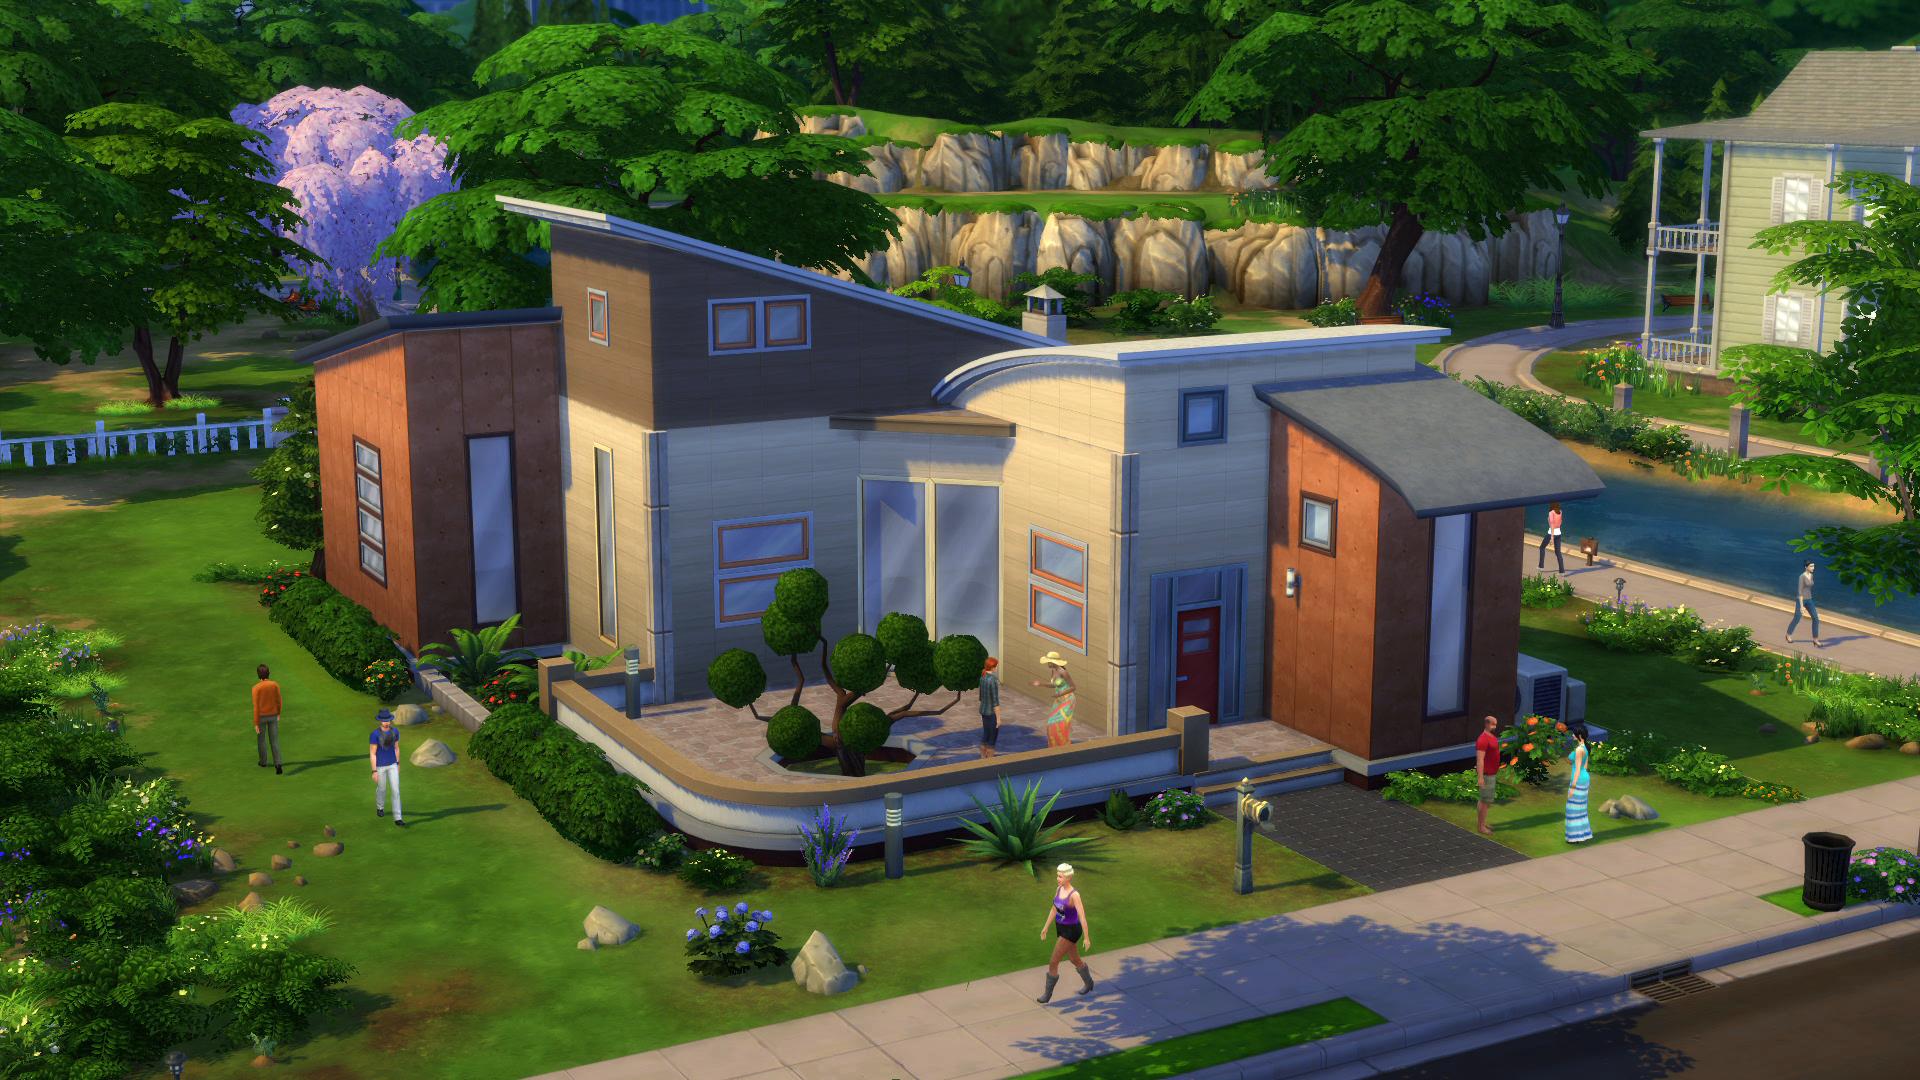 house - Build A House Simulator